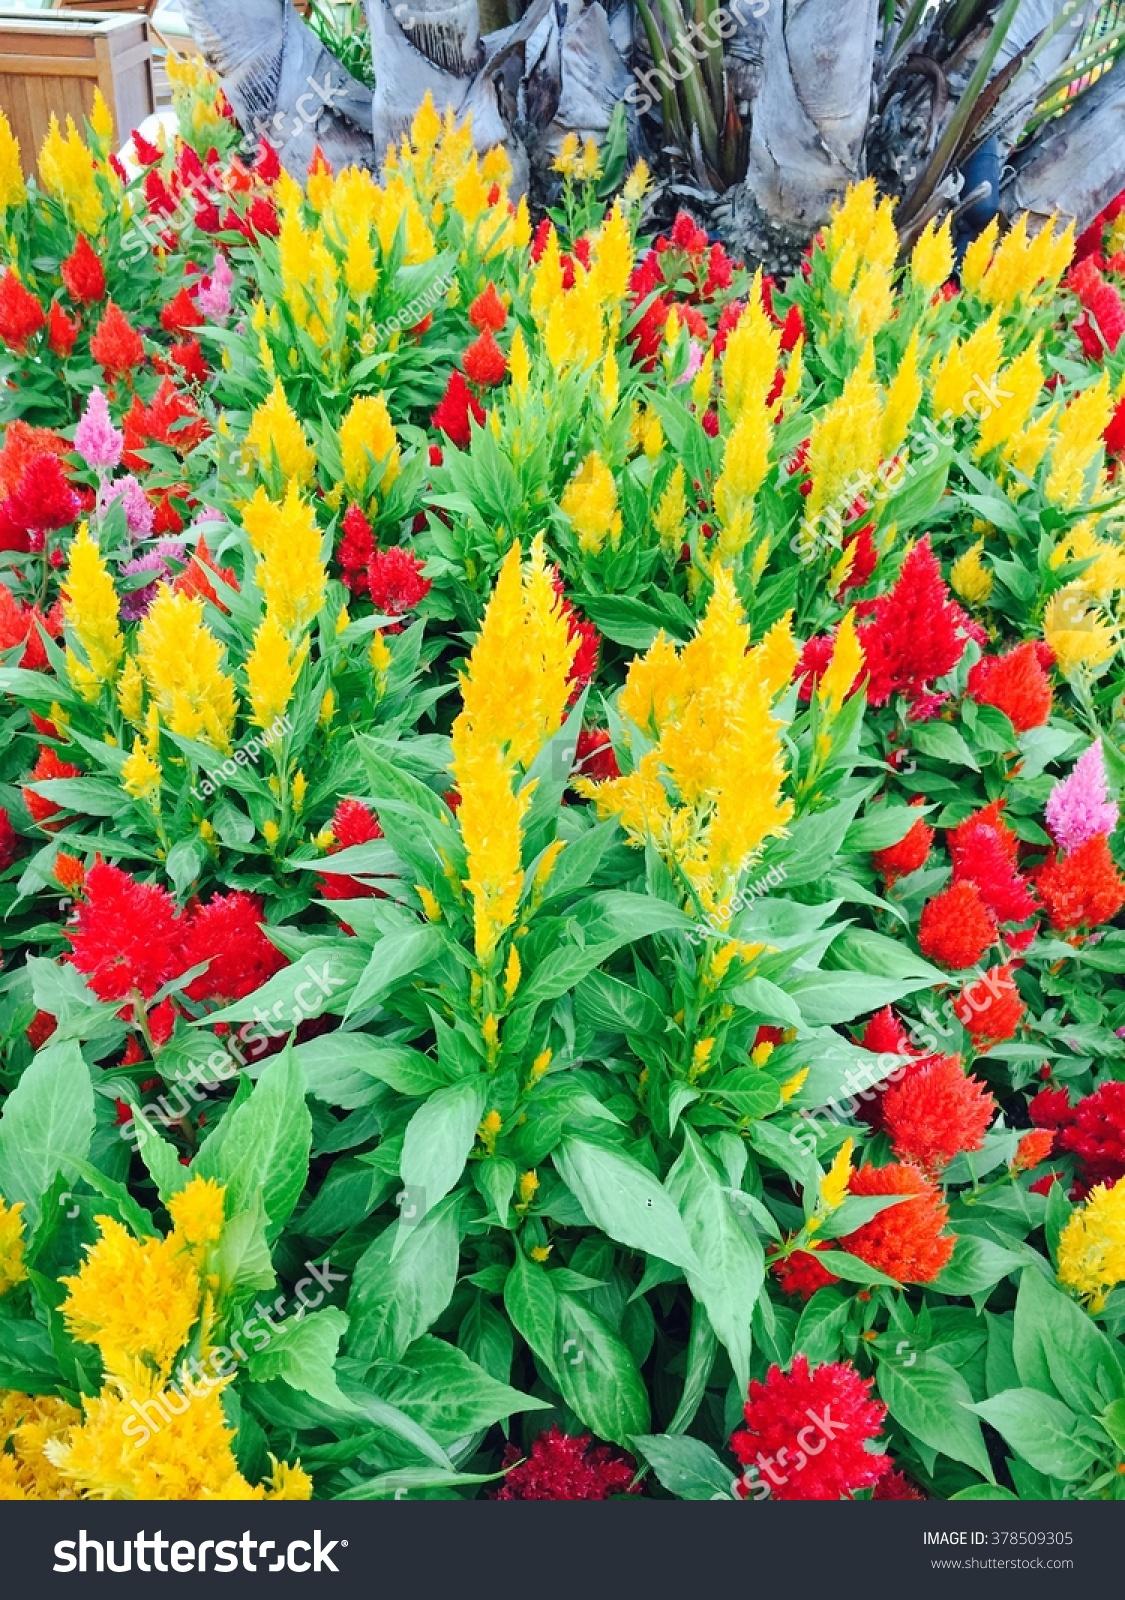 Beautiful natural flowers nature stock photo edit now 378509305 beautiful natural flowers in nature izmirmasajfo